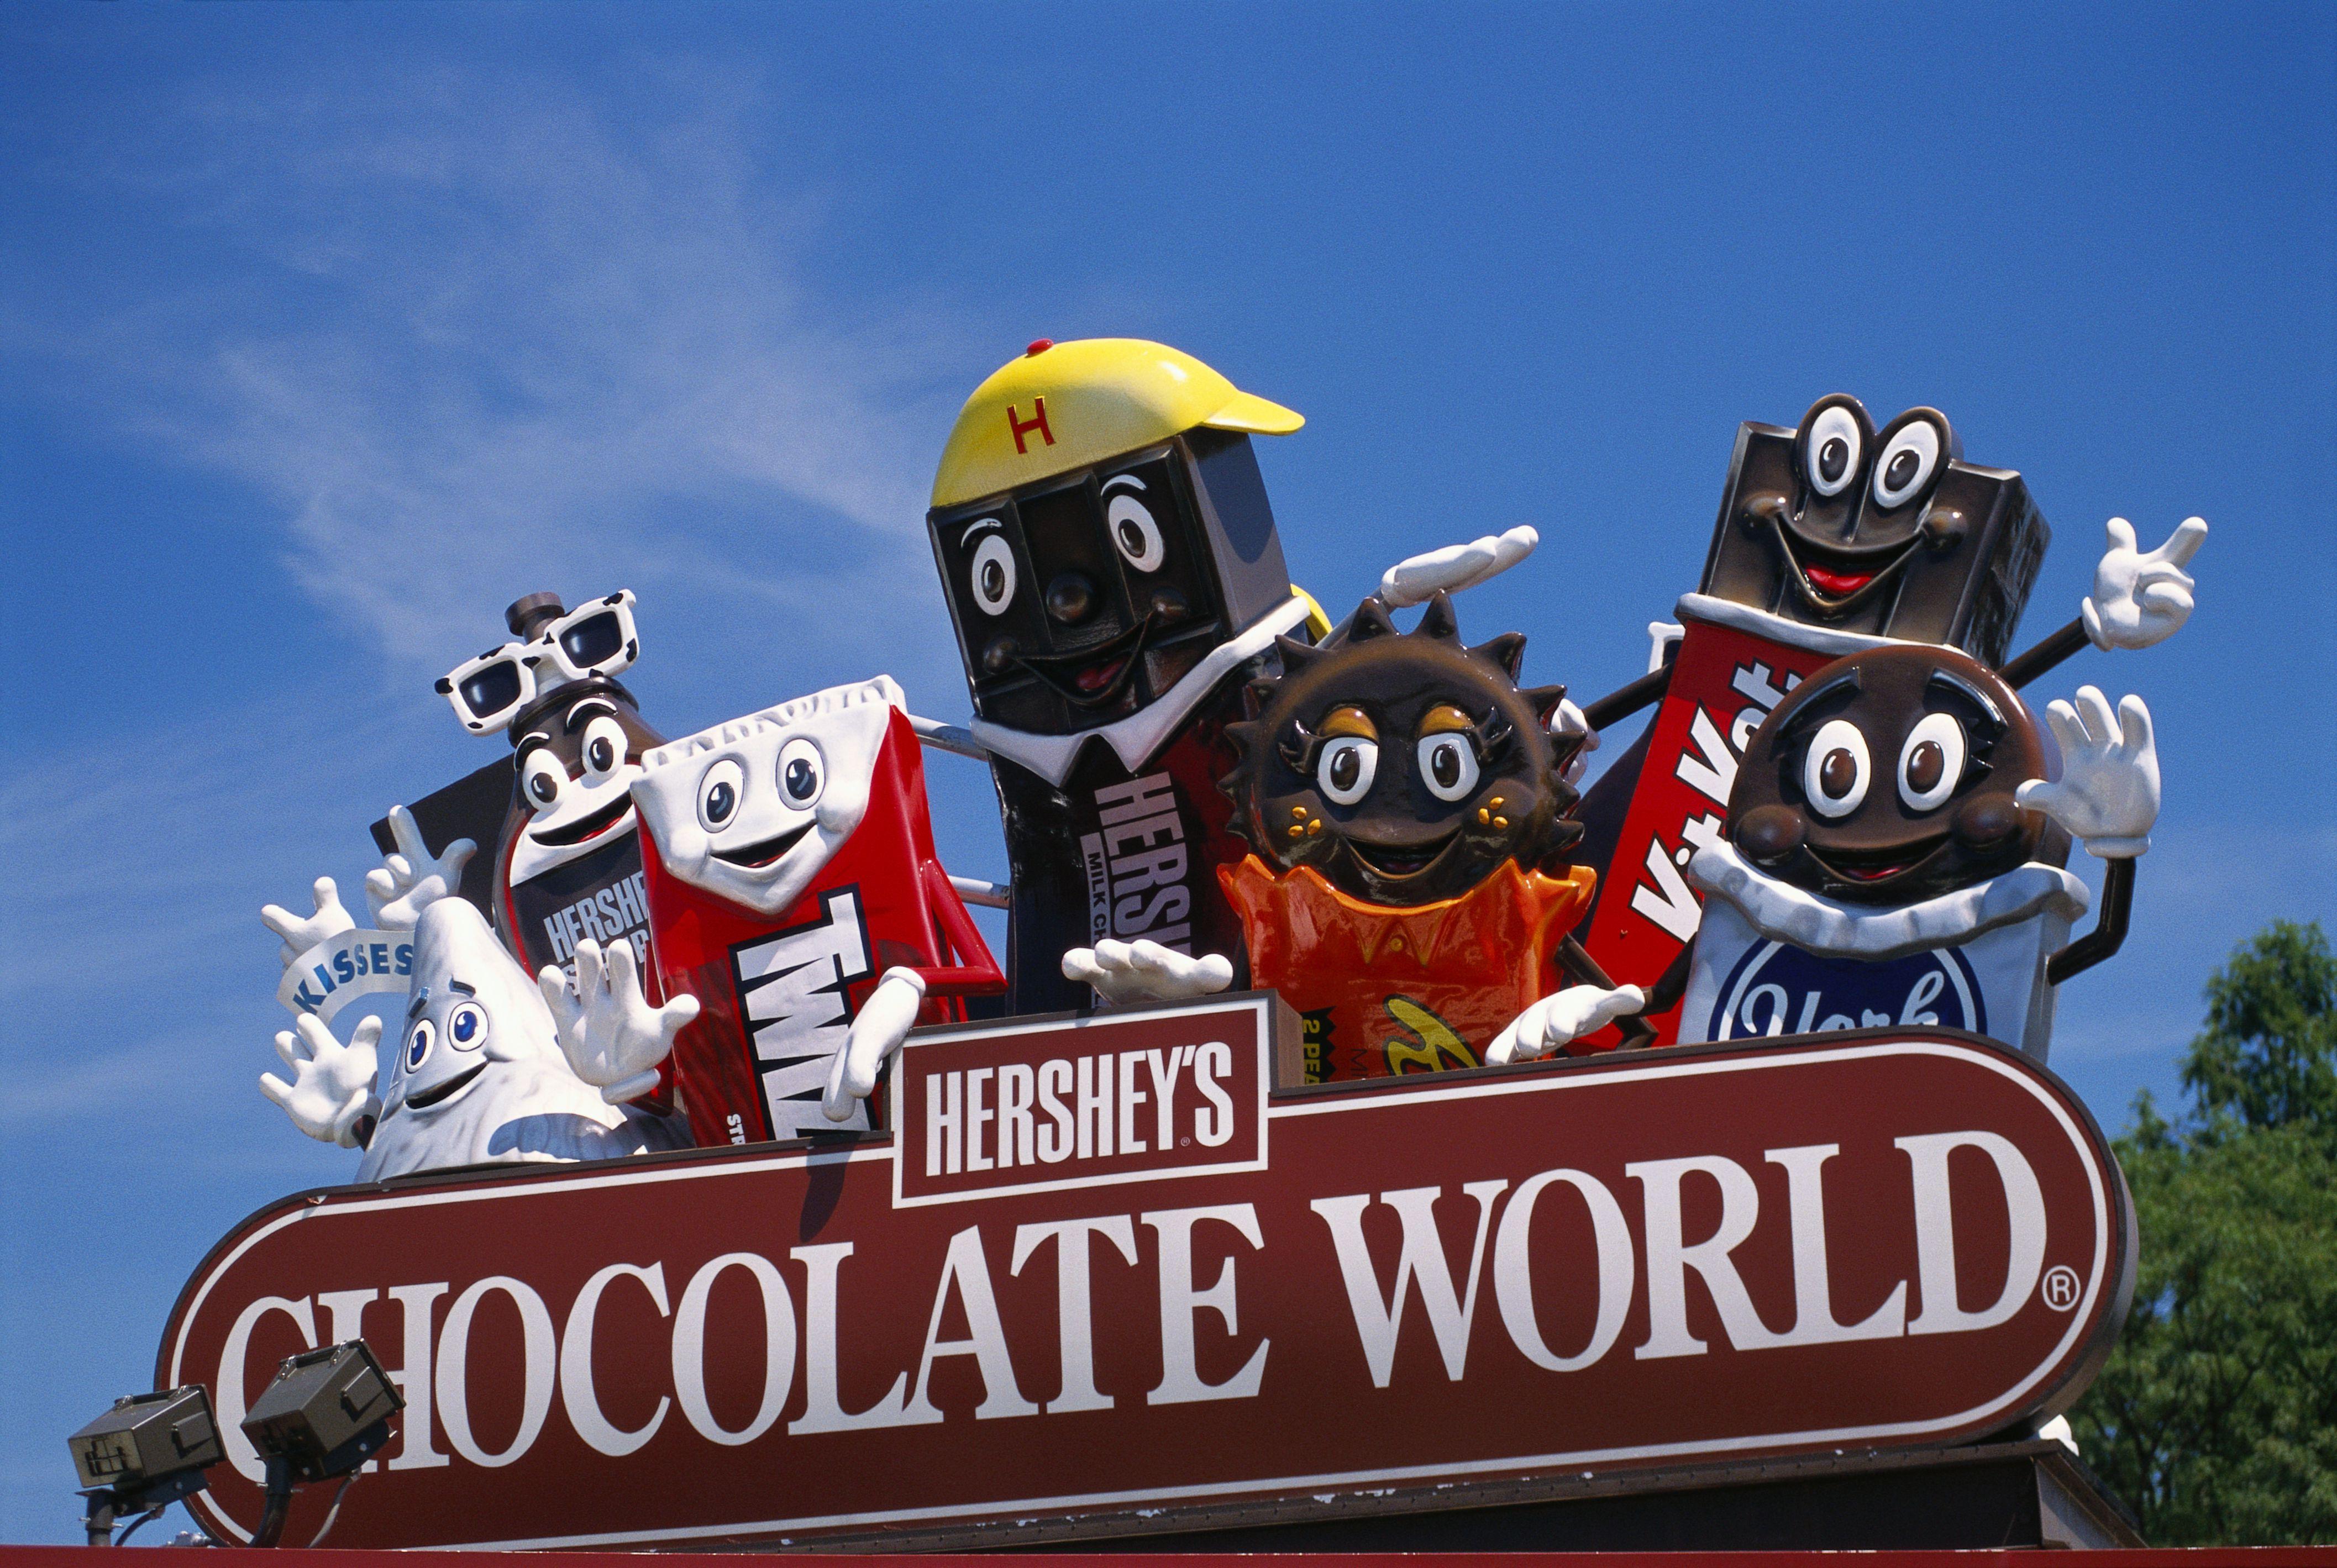 Hersheypark sign for Chocolate World